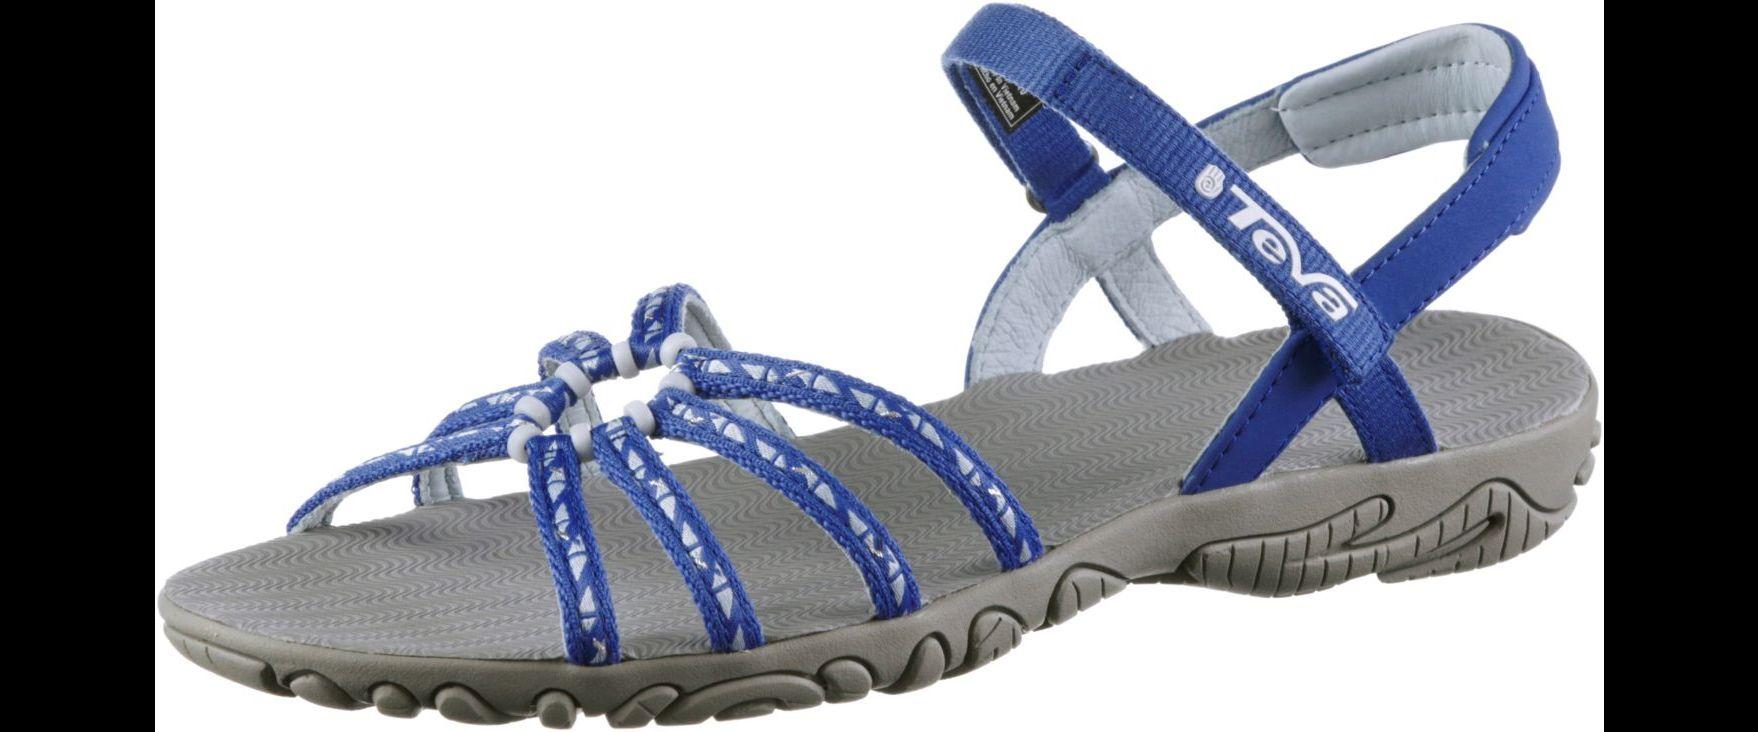 Teva Kayenta cascade blue Damensandale mit grazilen Bändern blau